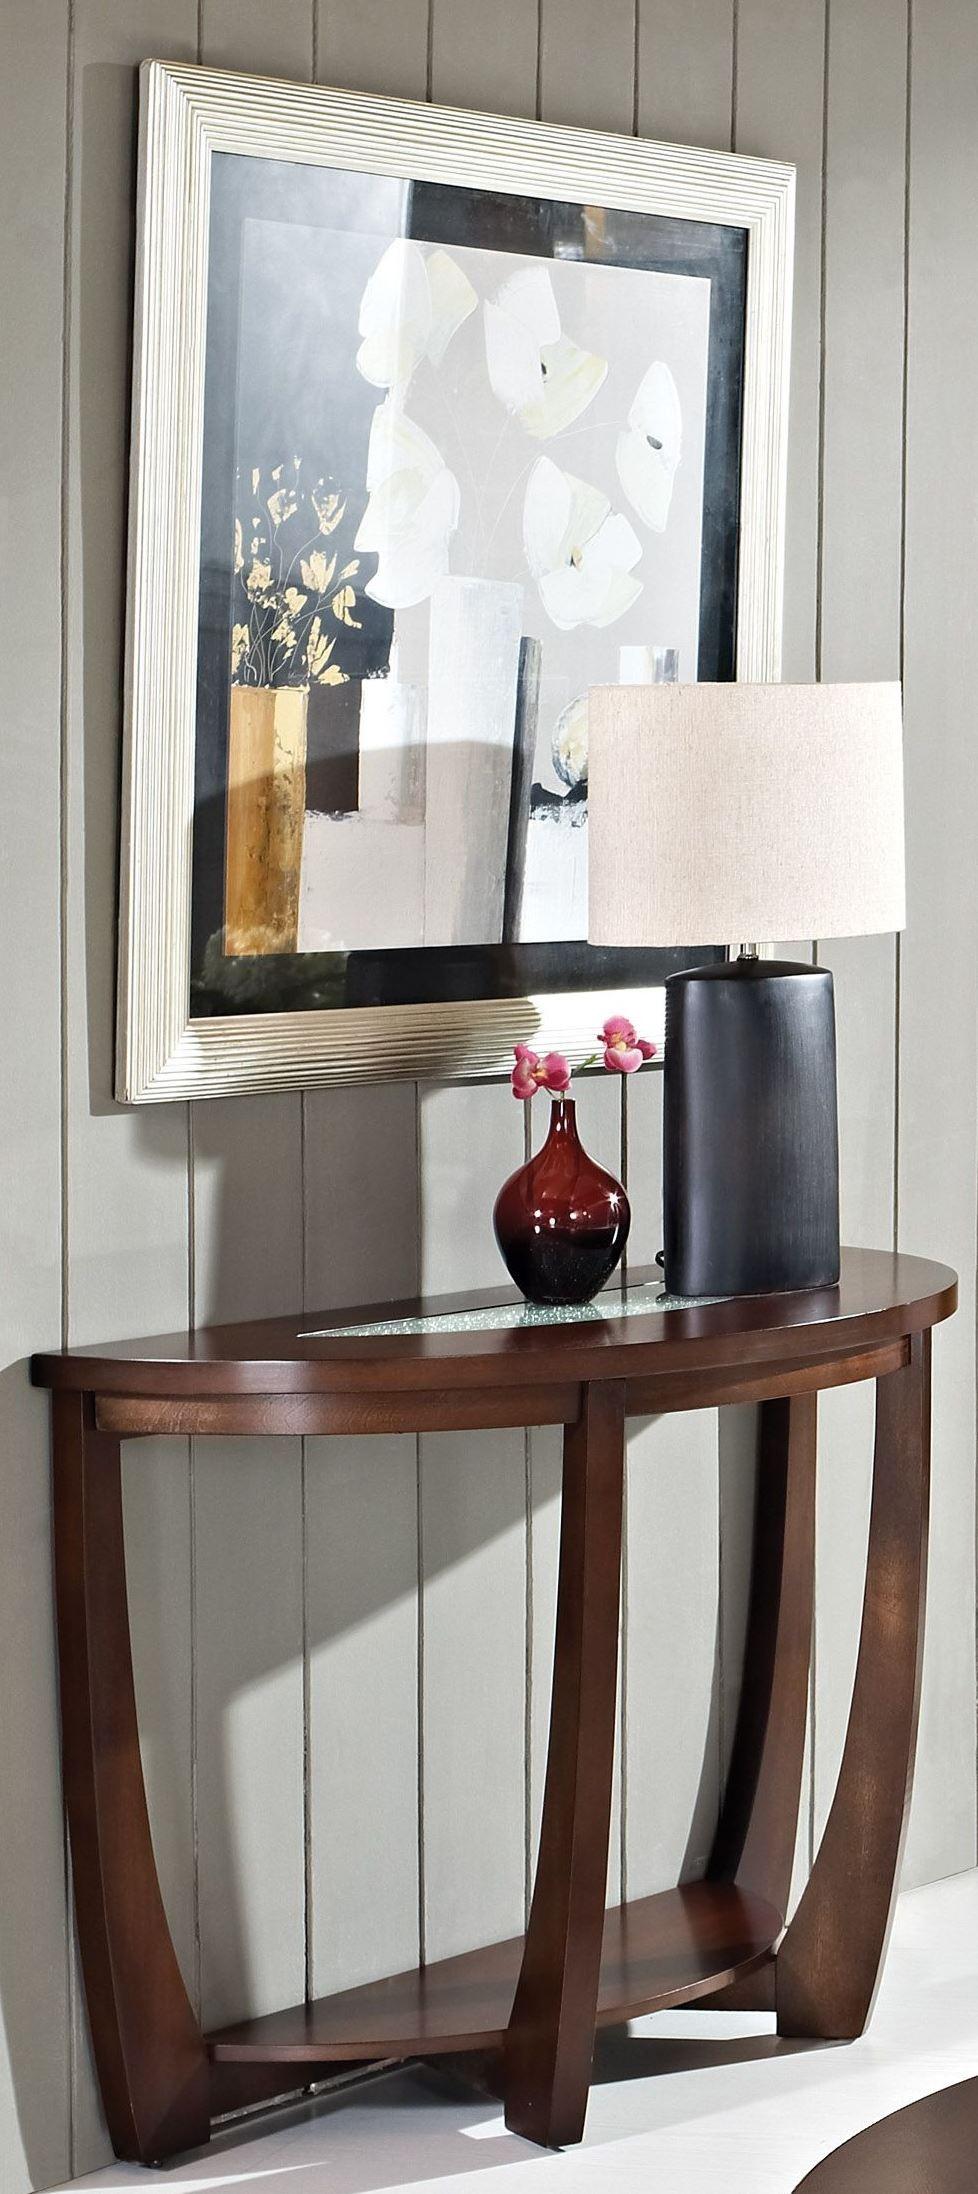 cherry sofa table. Rafael Merlot Cherry Sofa Table